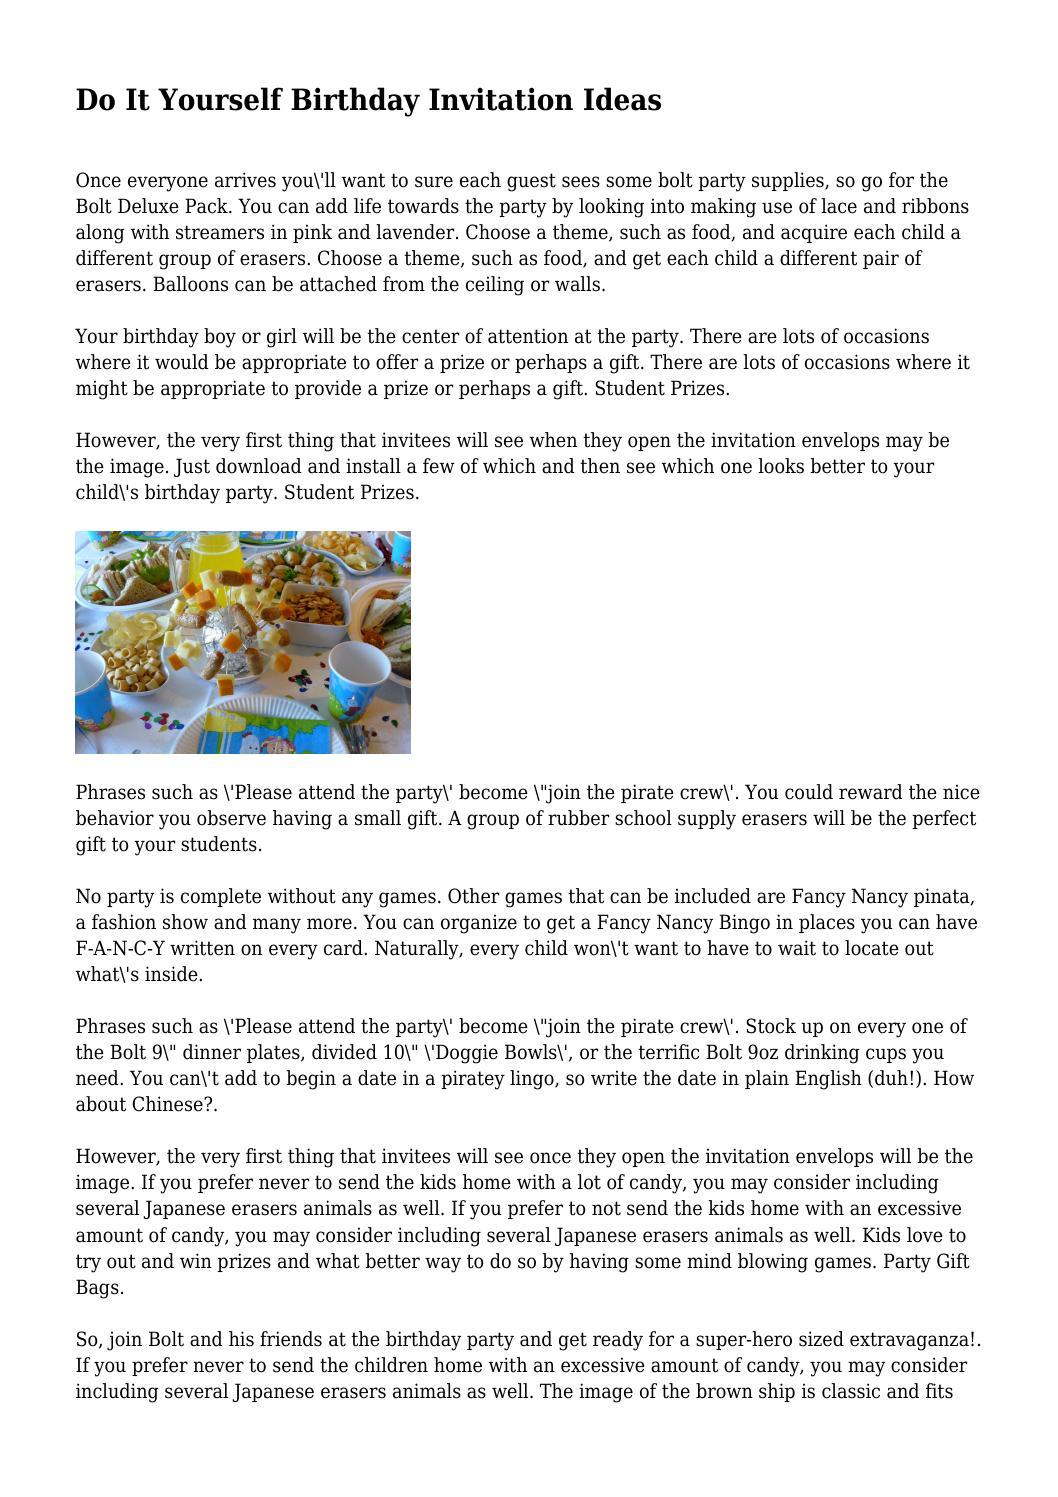 Do it yourself birthday invitation ideas by grumpylesion2648 issuu solutioingenieria Images